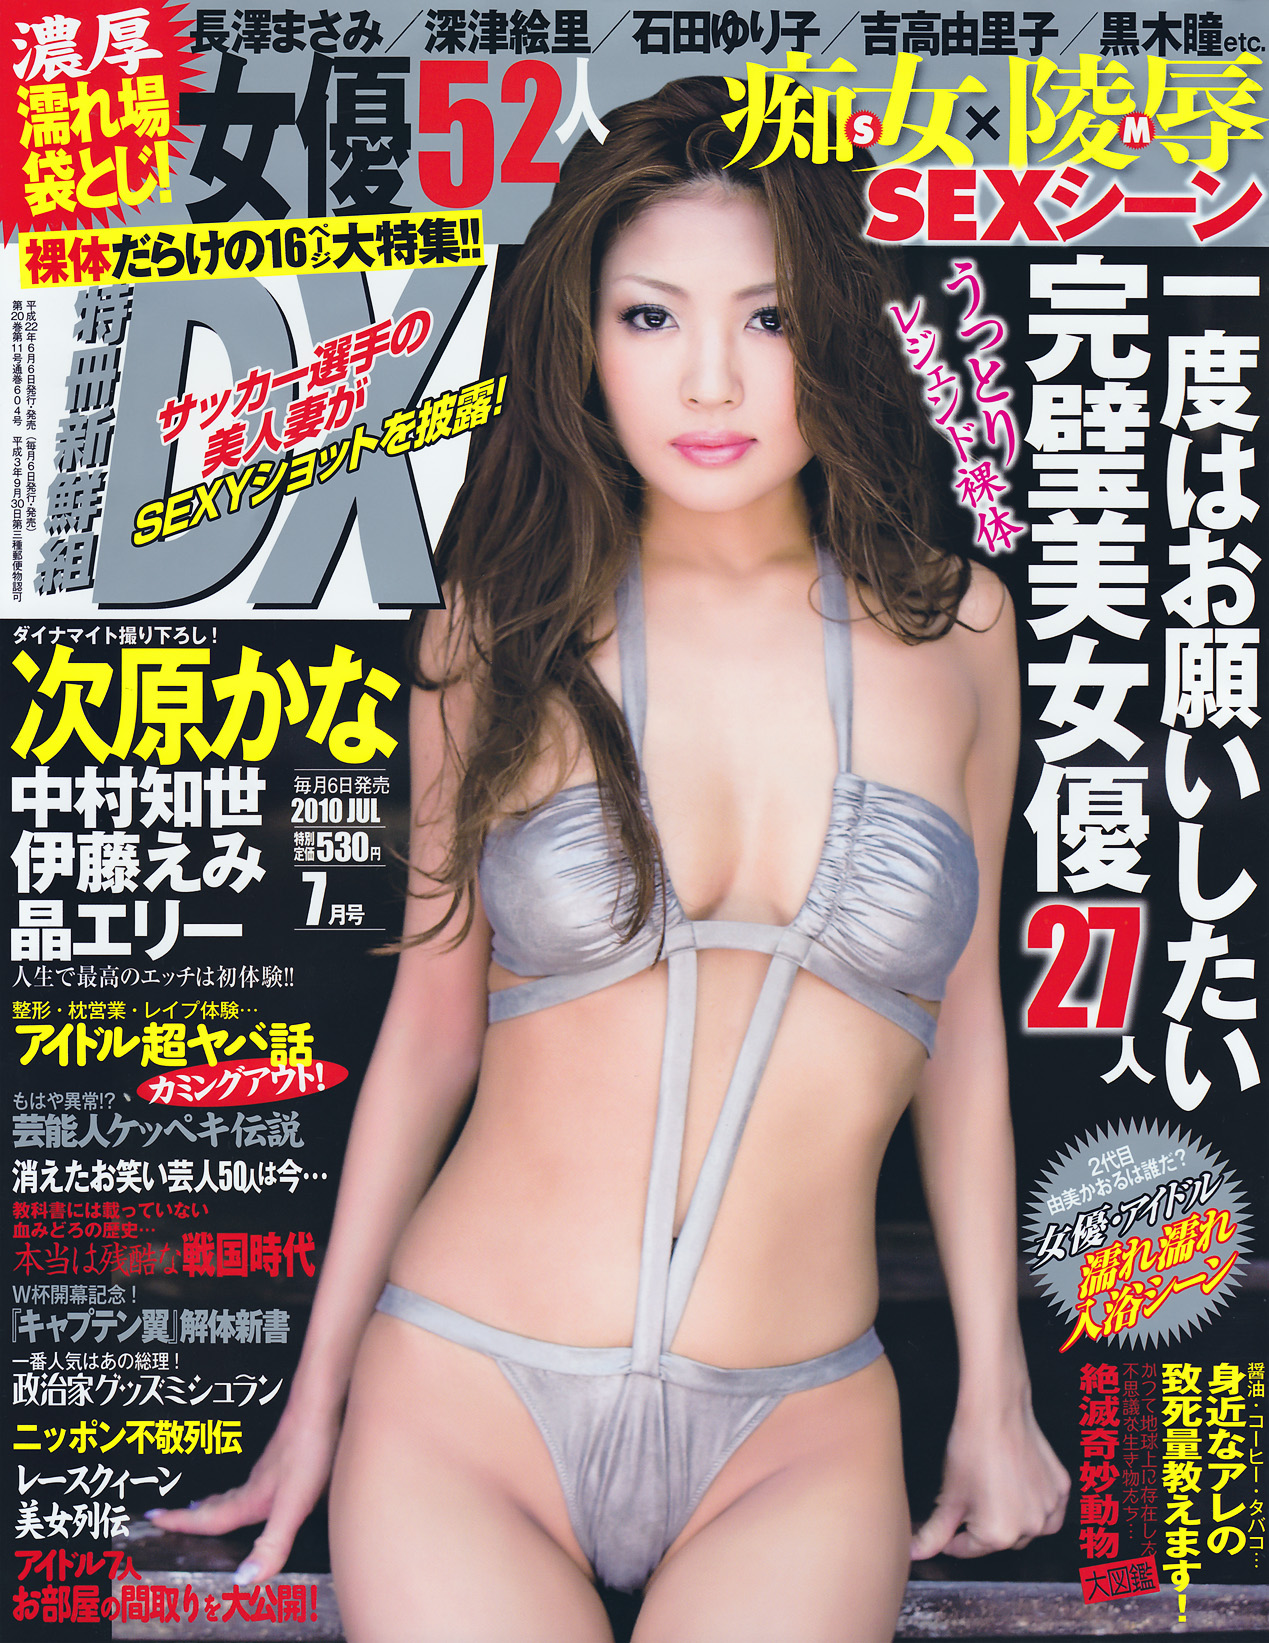 [HF] DX Magazine - July 2010